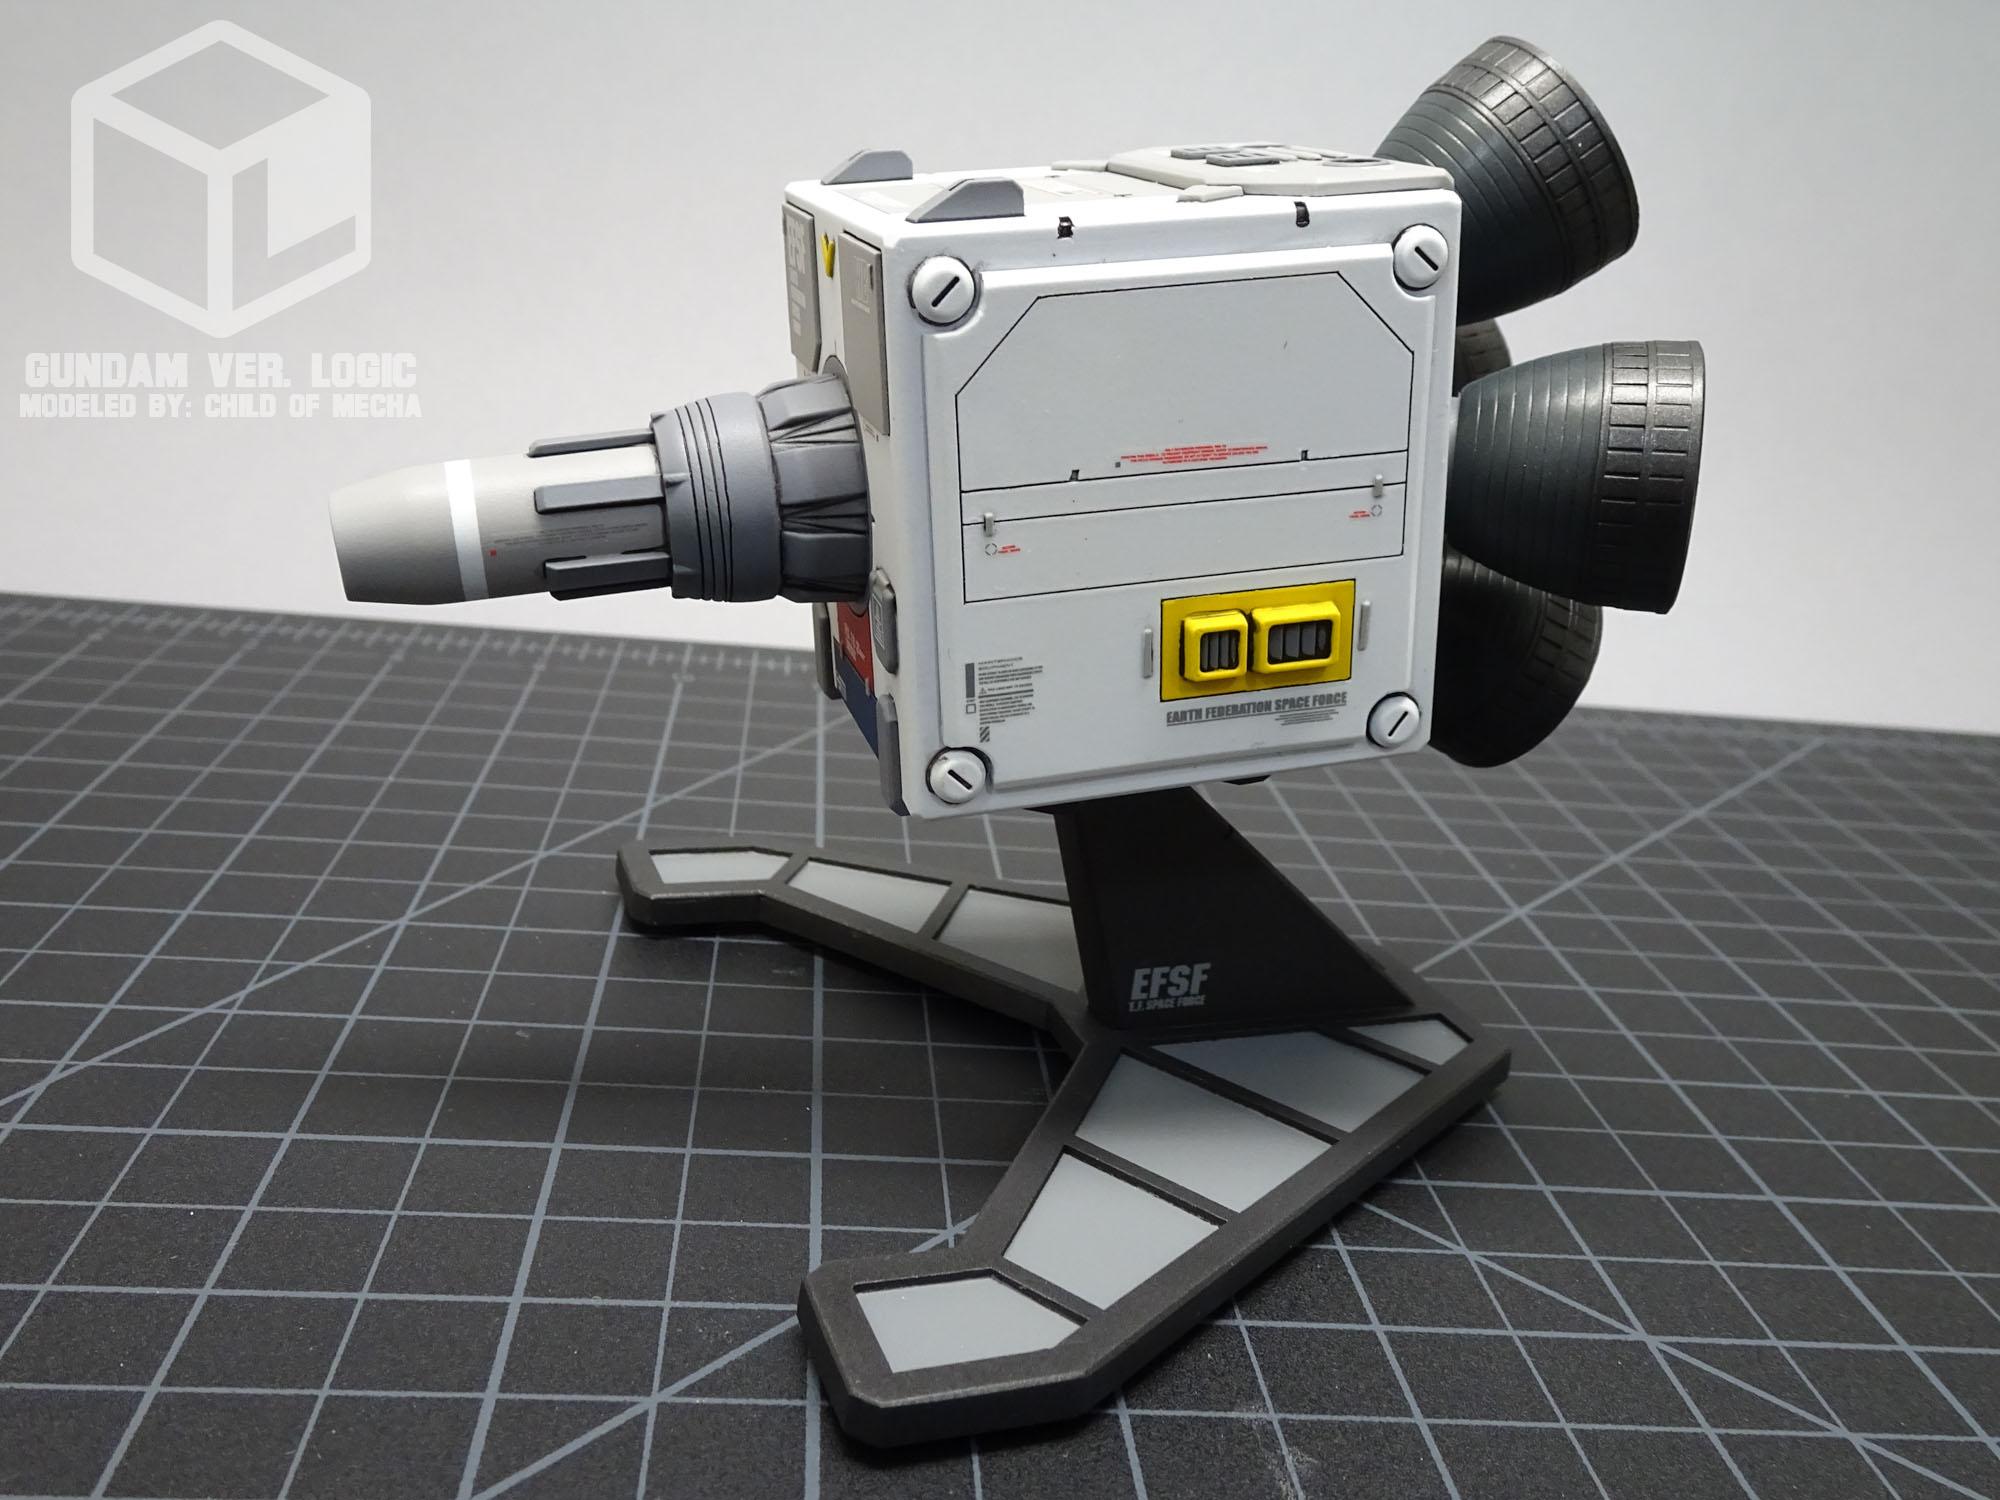 Gundam ver. Logic (23).jpg